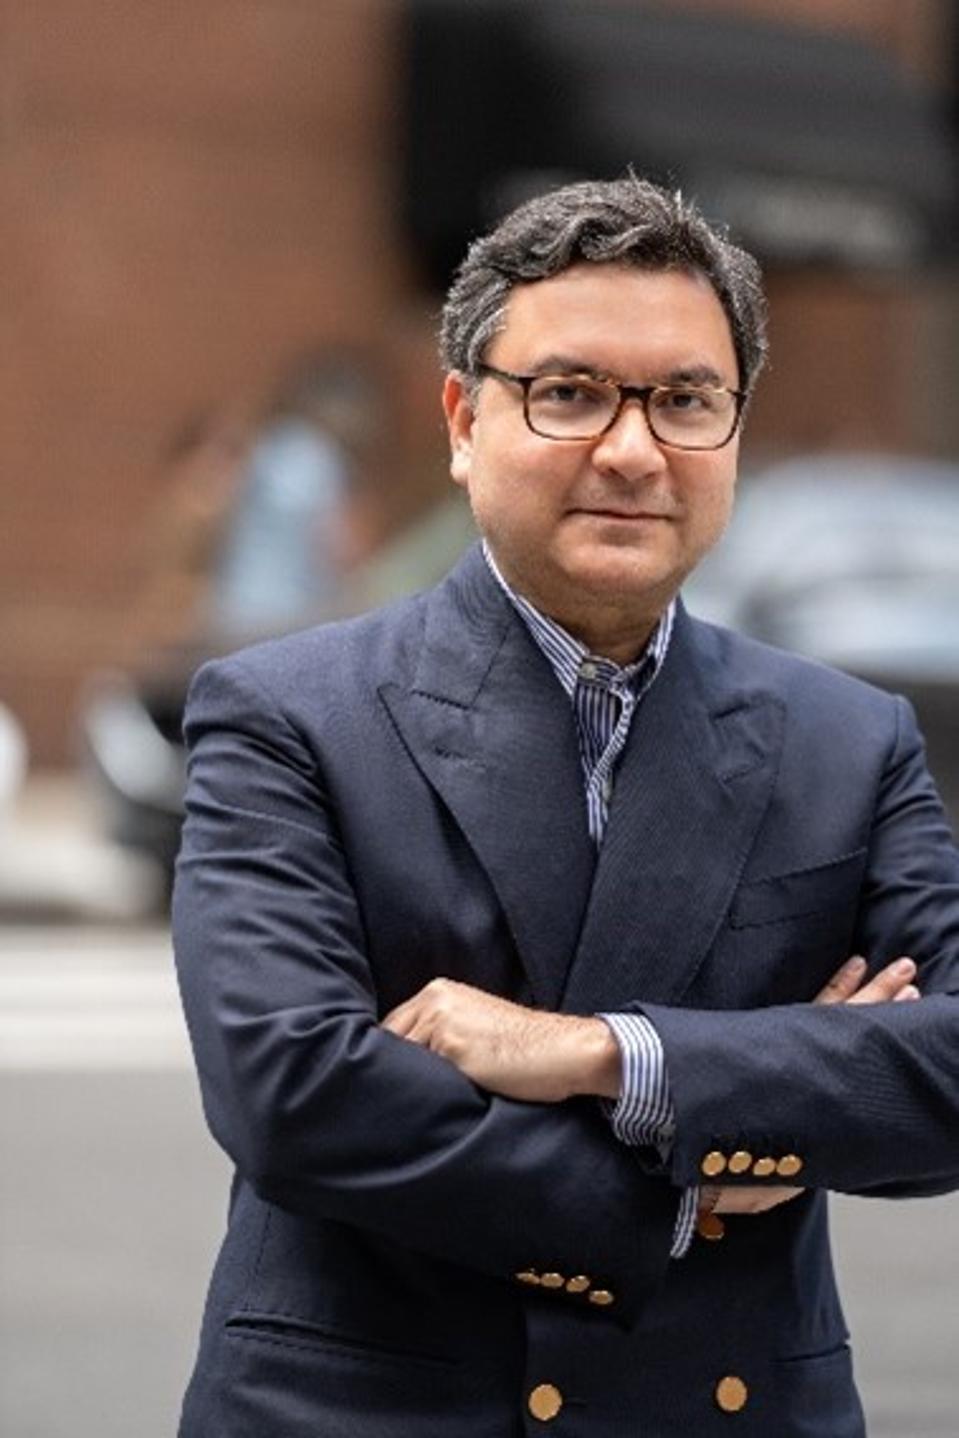 Here is president of Luxury Portfolio International Mickey Alam Khan